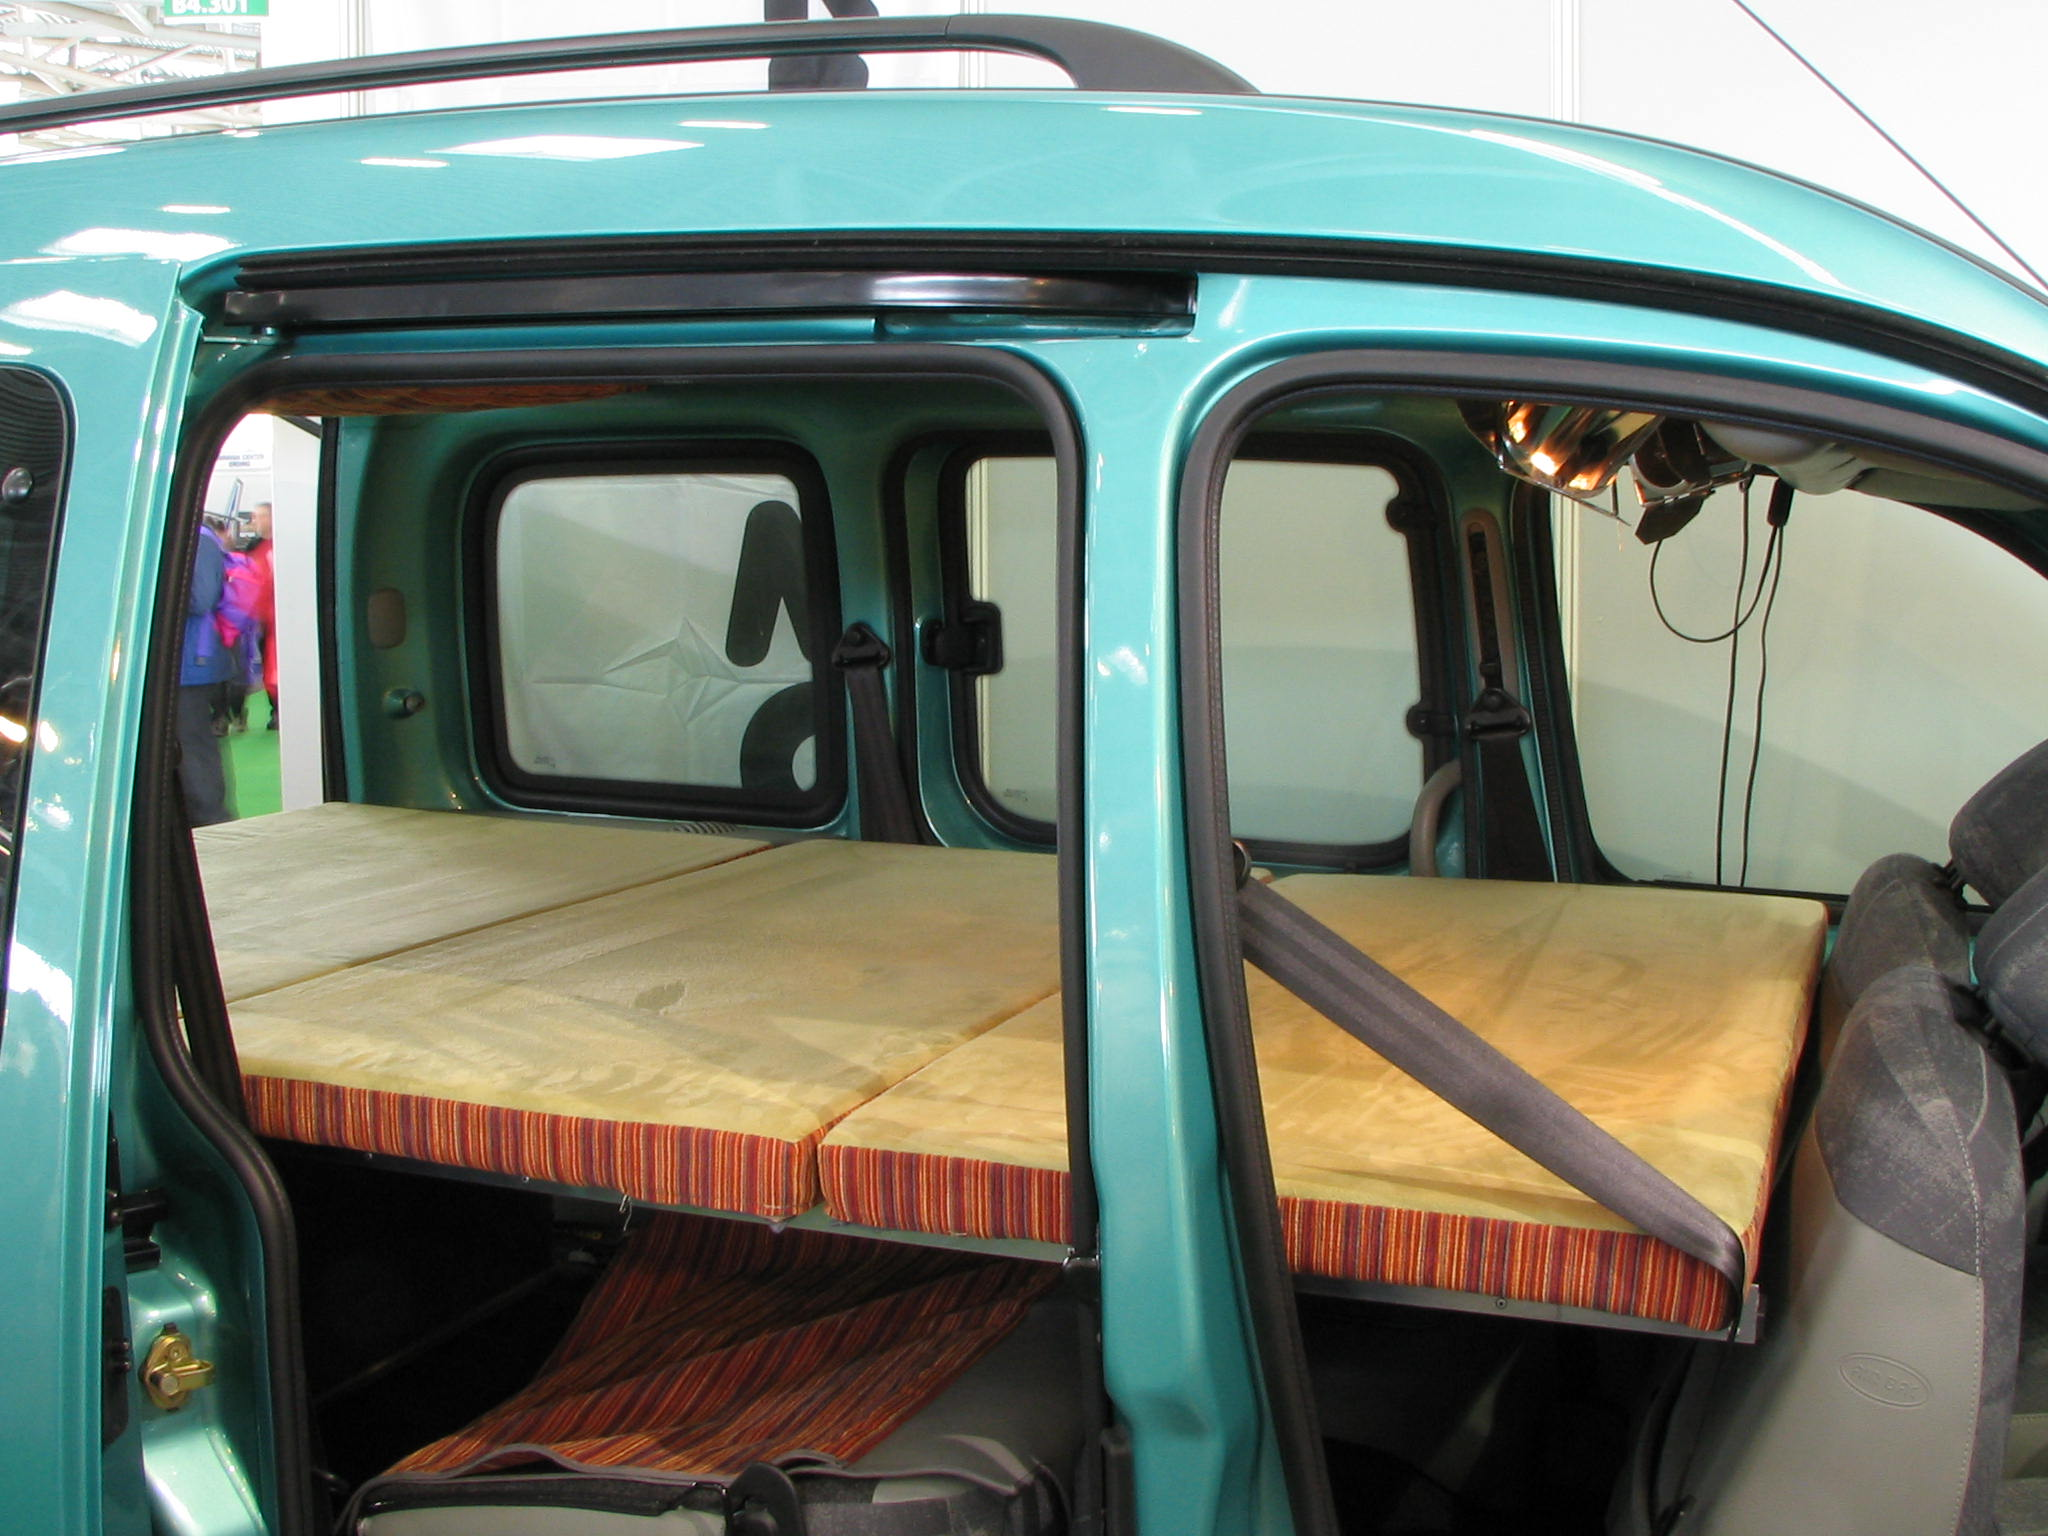 renault kangoo cuddy under bed. Black Bedroom Furniture Sets. Home Design Ideas